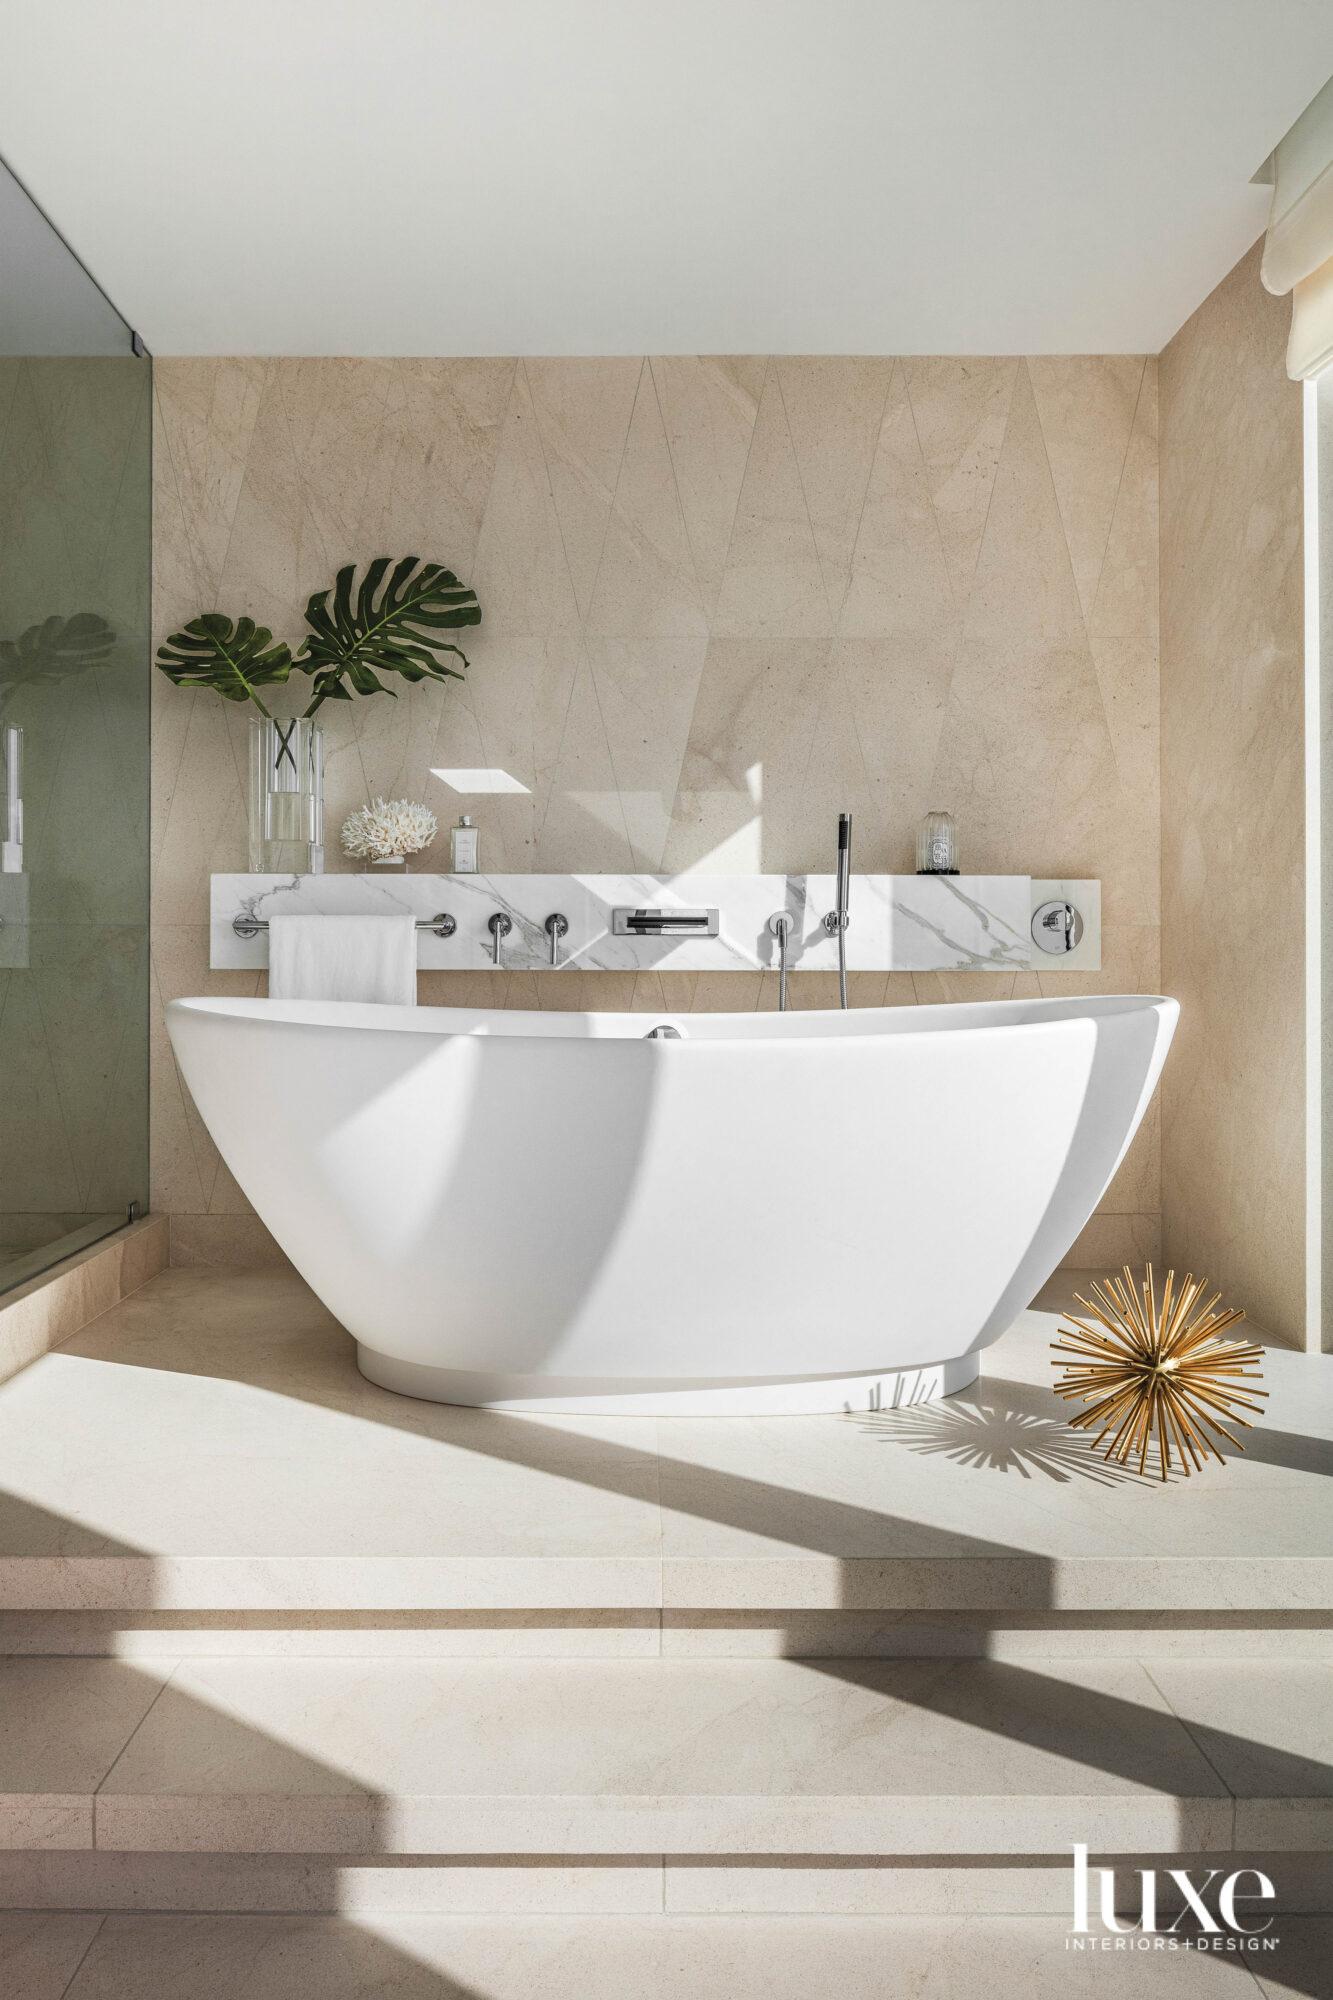 bathroom with freestanding white tub